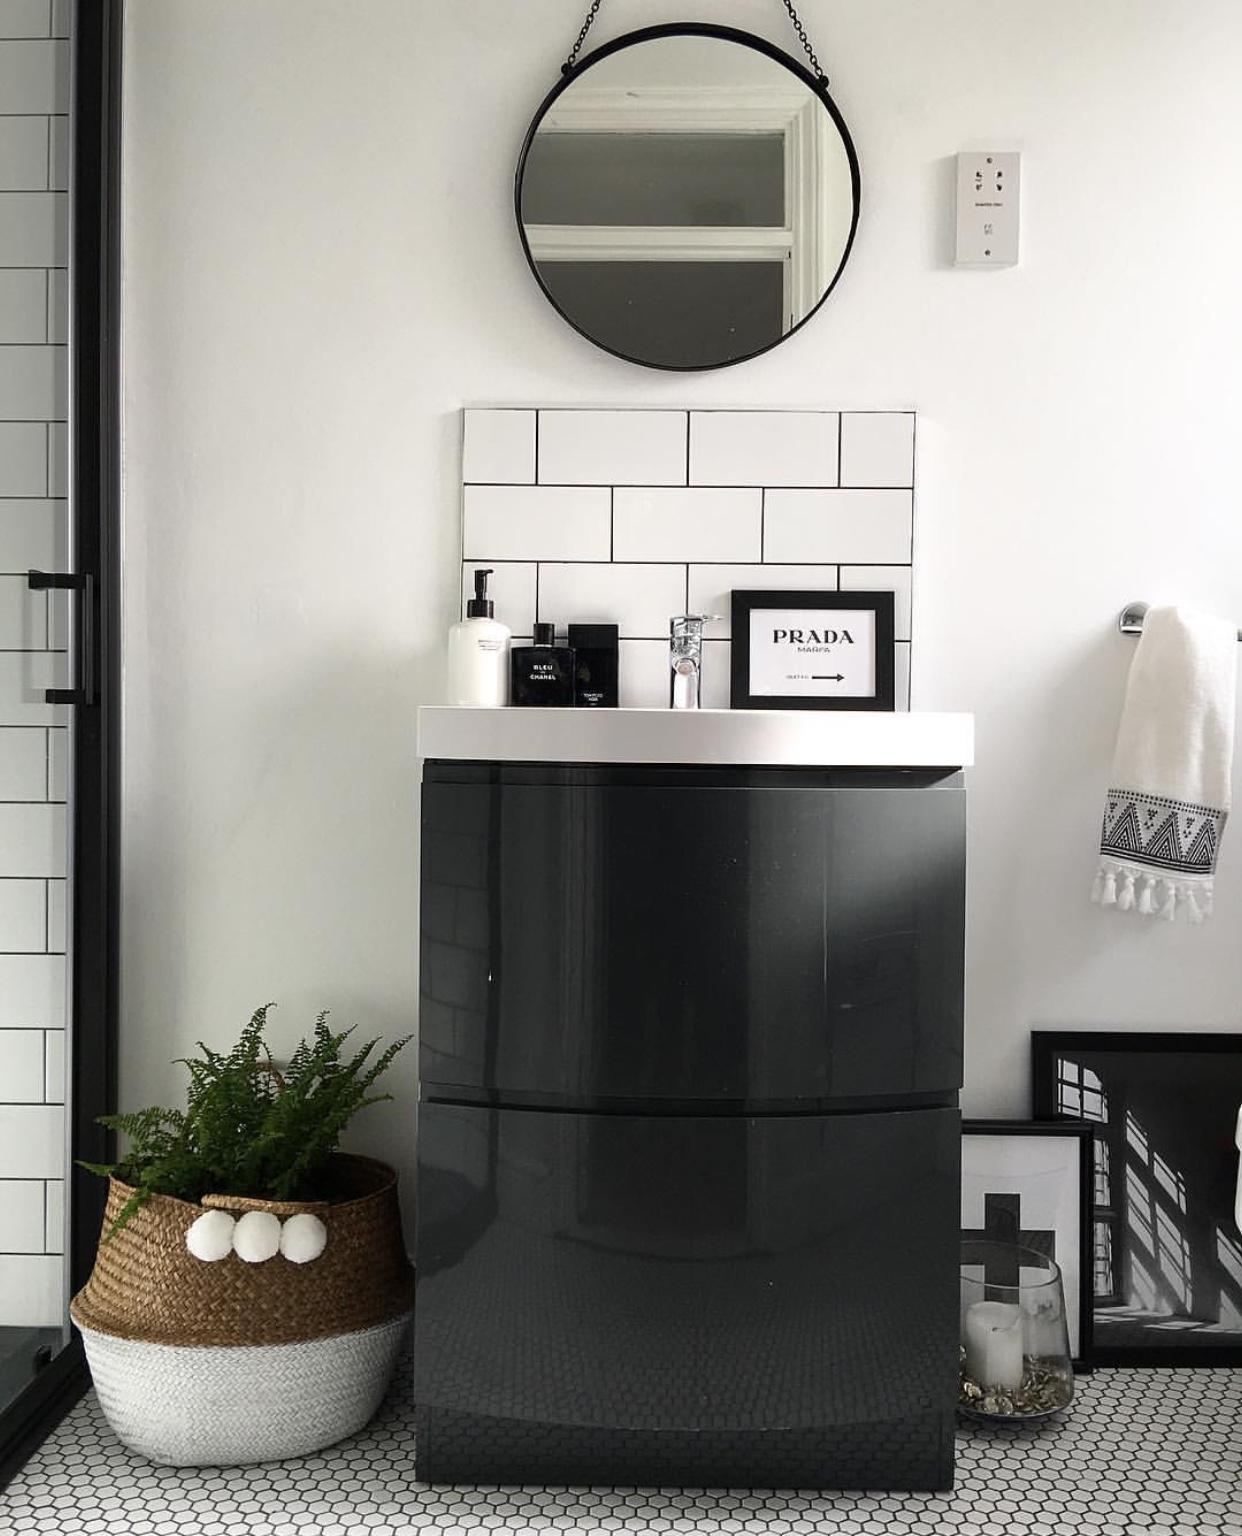 En suite:Floor tiles: Topps Tiles, Wall tiles: Tons of Tiles, Sink unit and shower door: Victoria Plum, Shower tray:  soak.com , Belly Basket: Sunshine and Shade